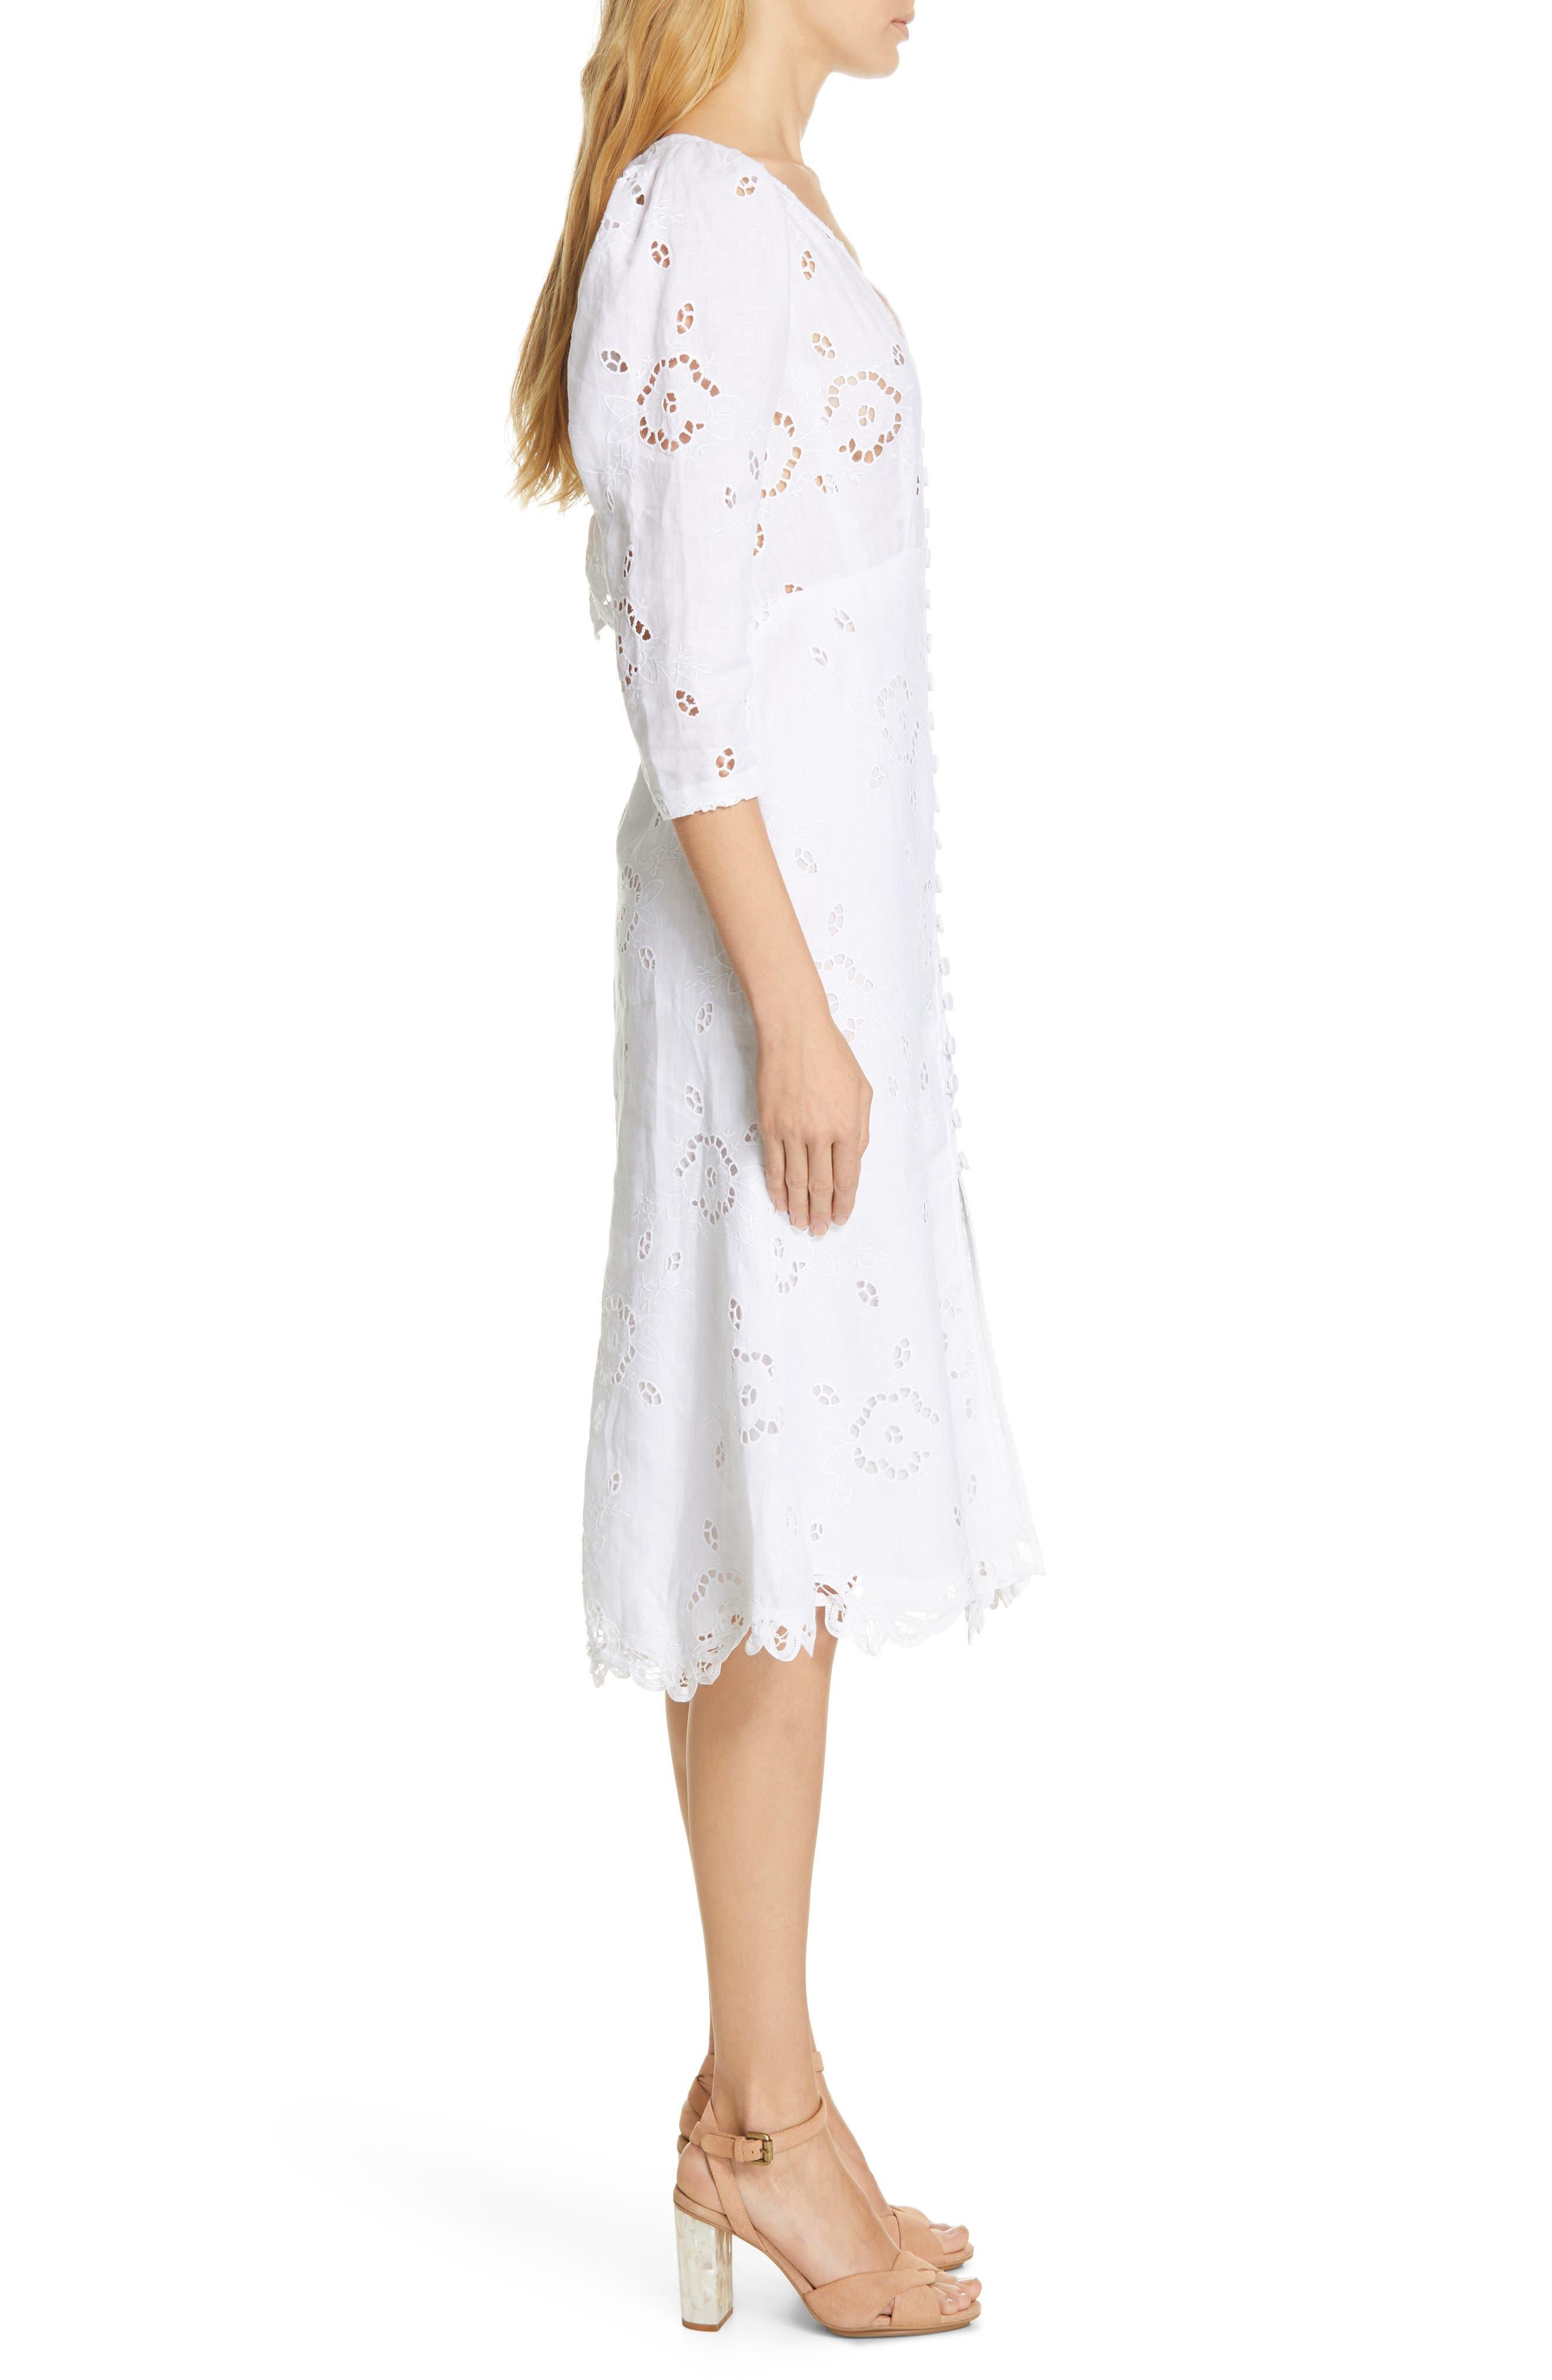 REBECCA TAYLOR, Terri Embroidered A-Line Dress, Alternate thumbnail 4, color, MILK